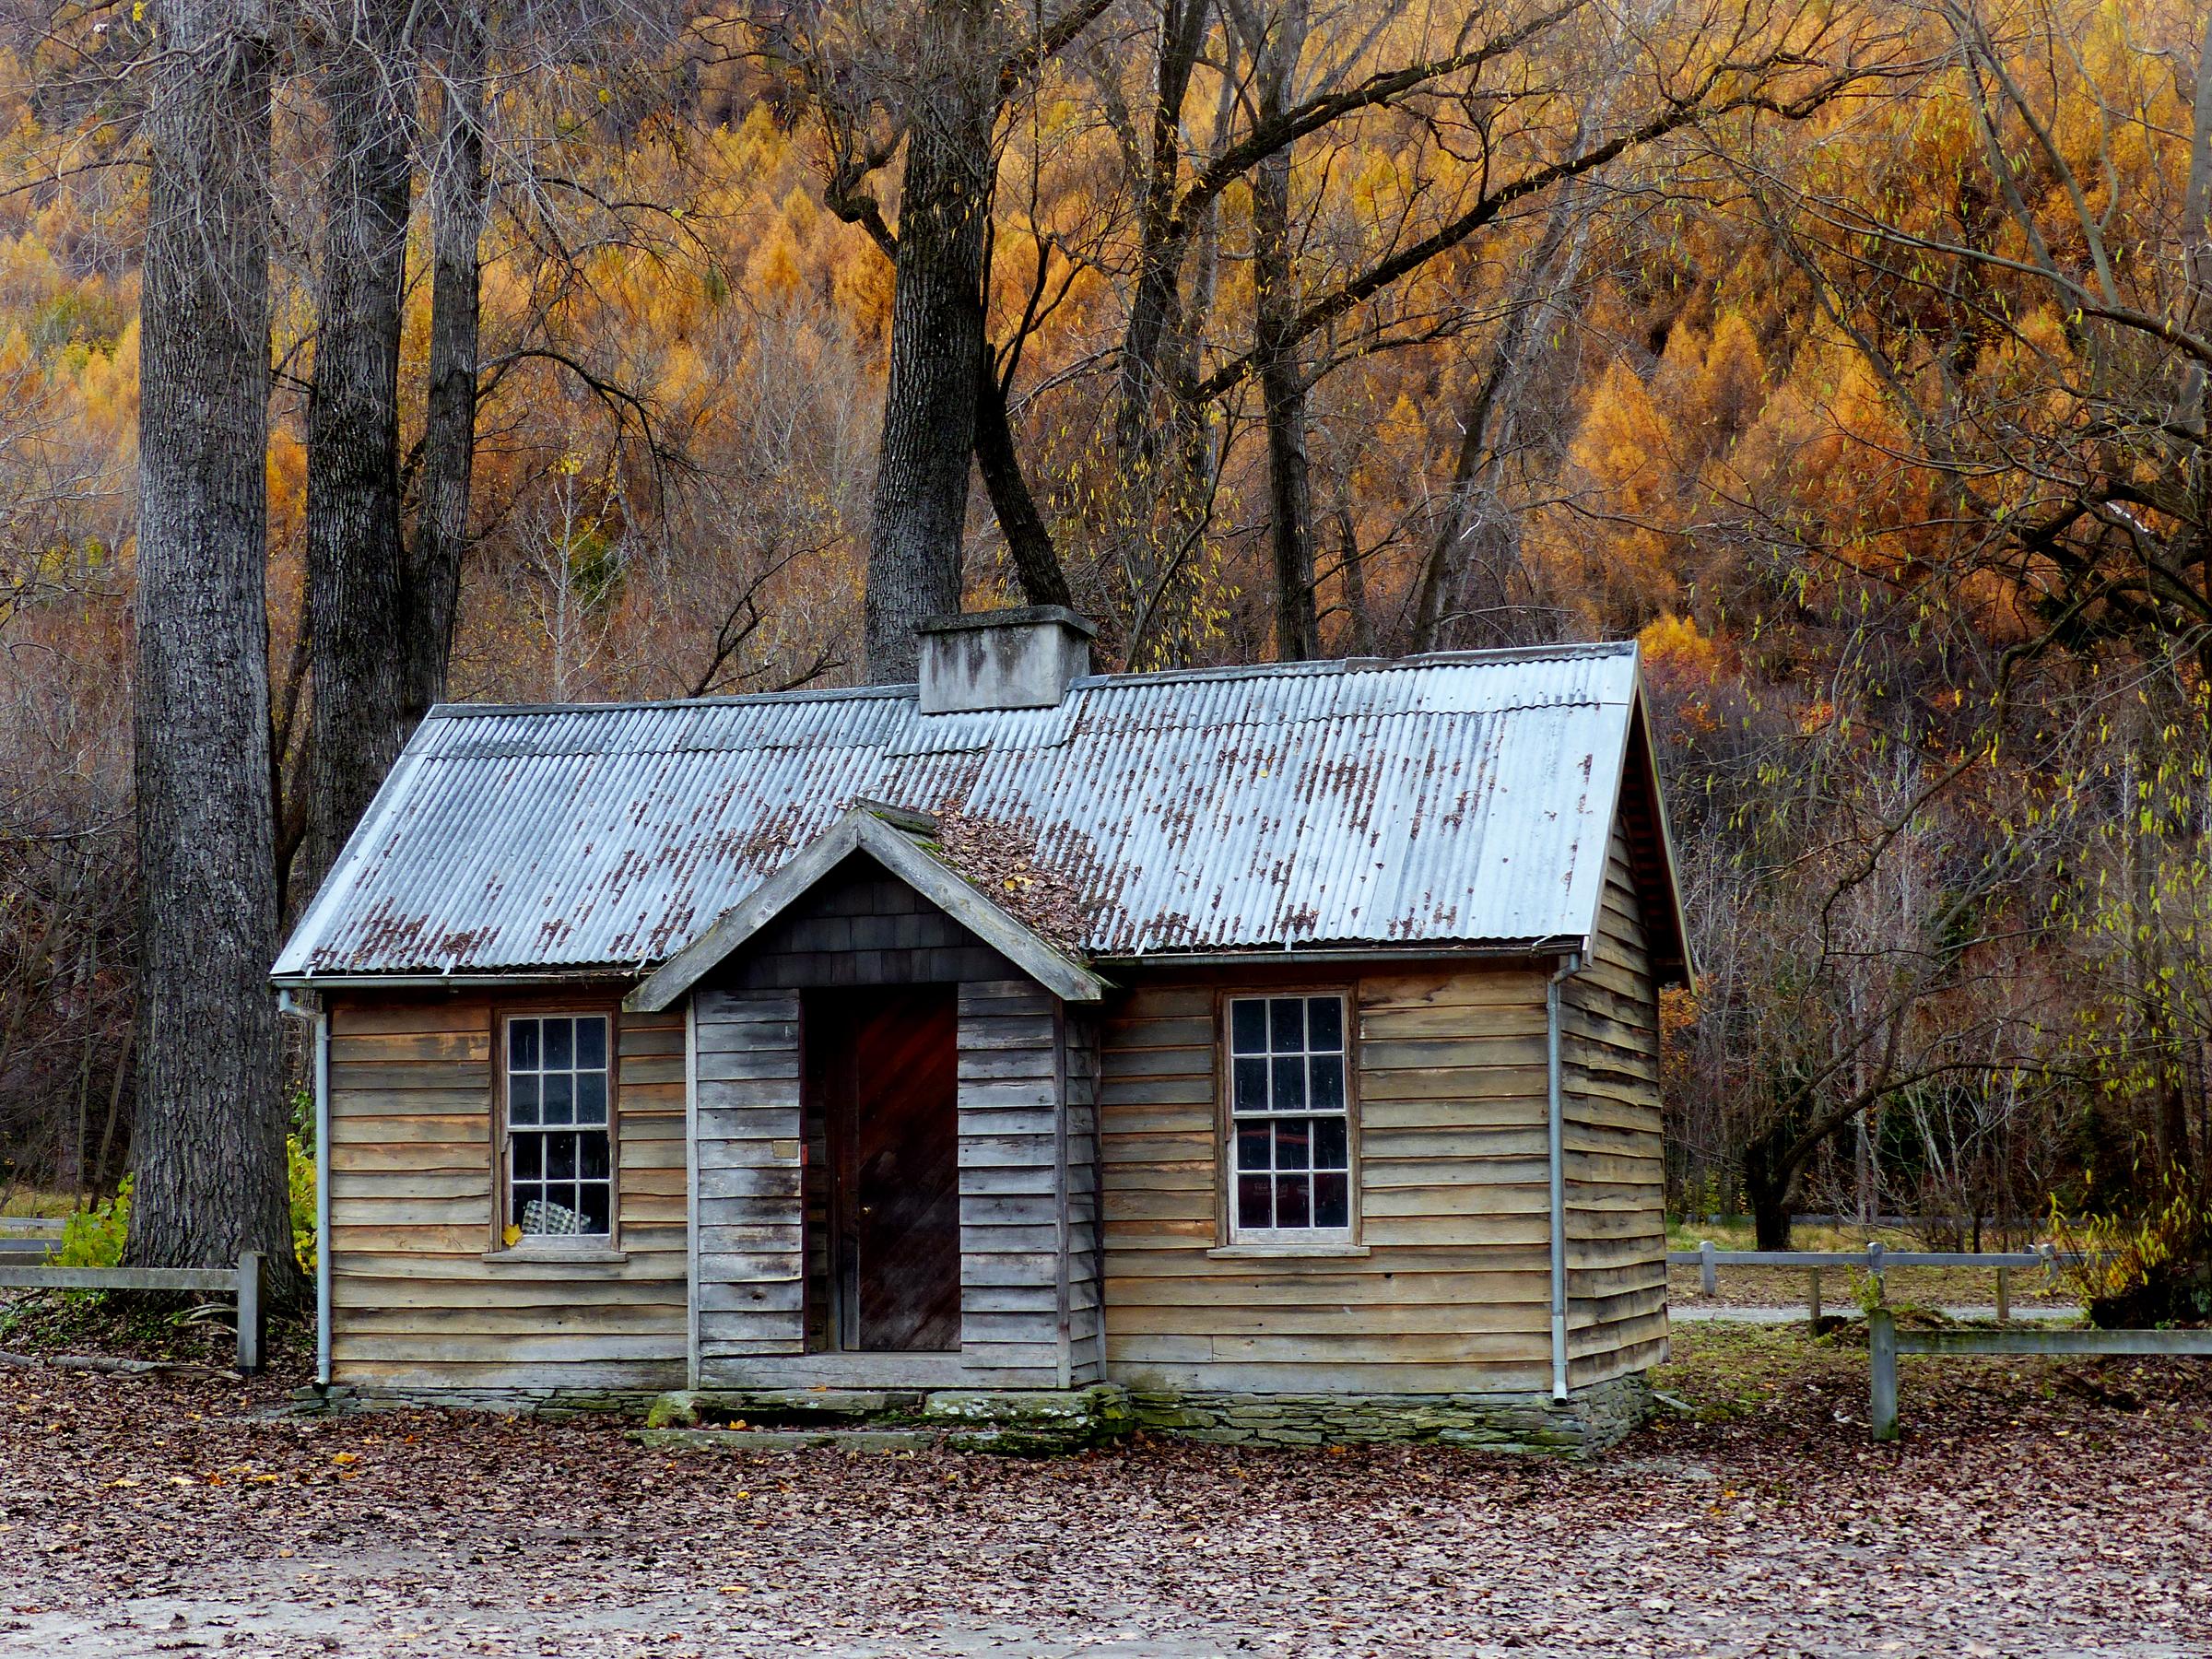 Fotos gratis : árbol, granja, edificio, granero, cobertizo, choza ...